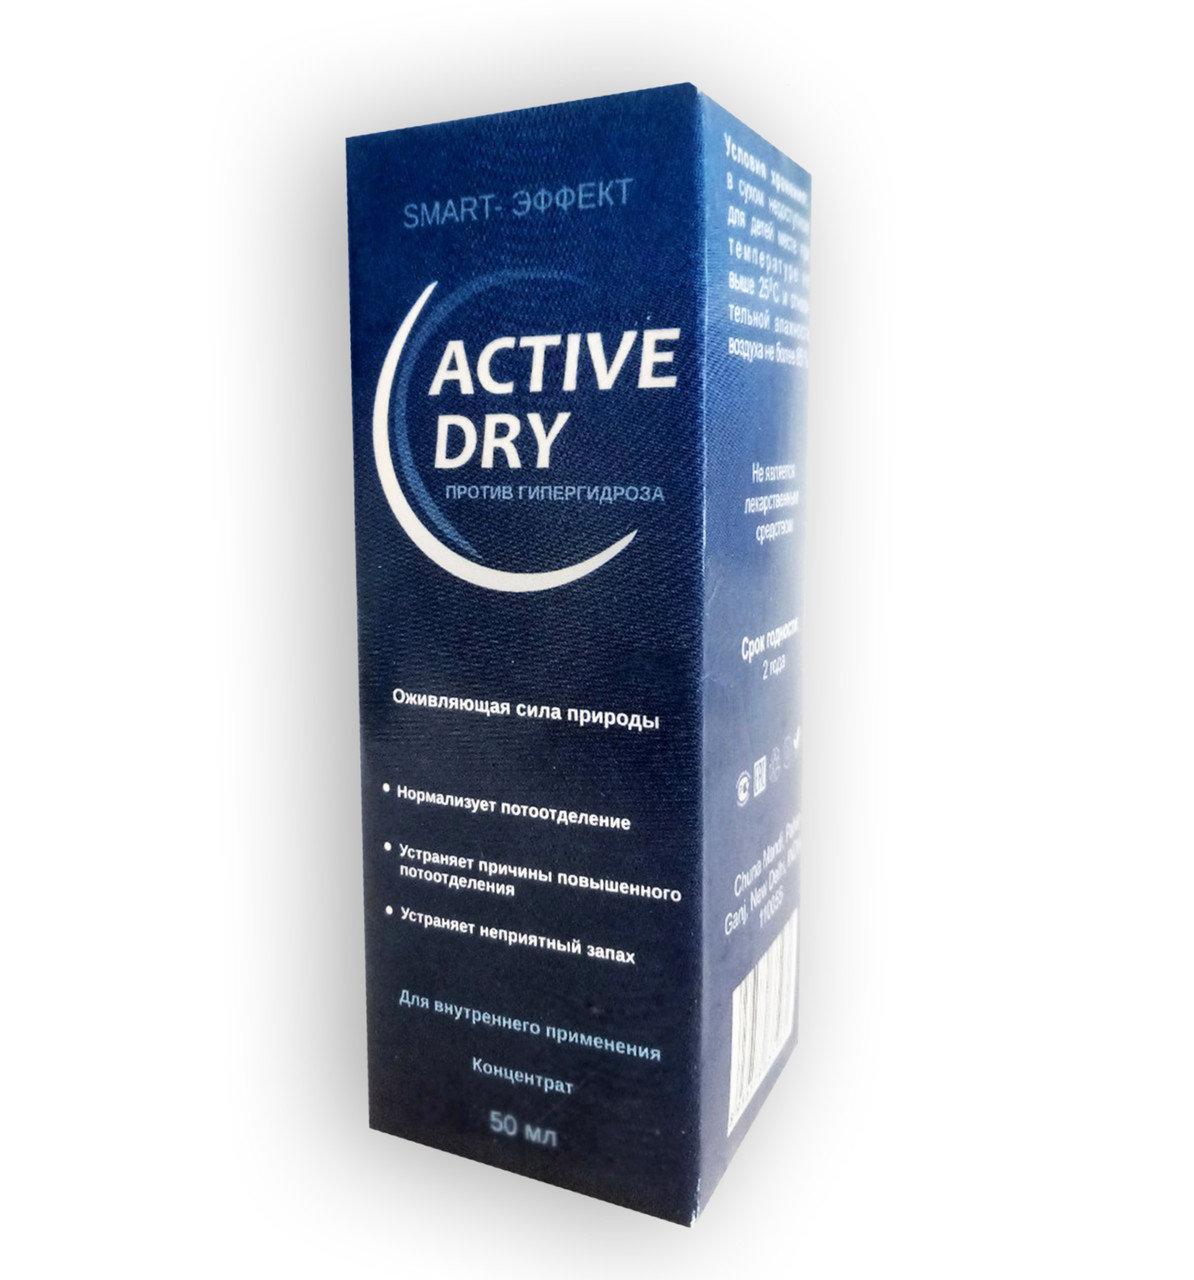 Active dry – Концентрат против гипергидроза (потливости) (Актив Драй) ViP